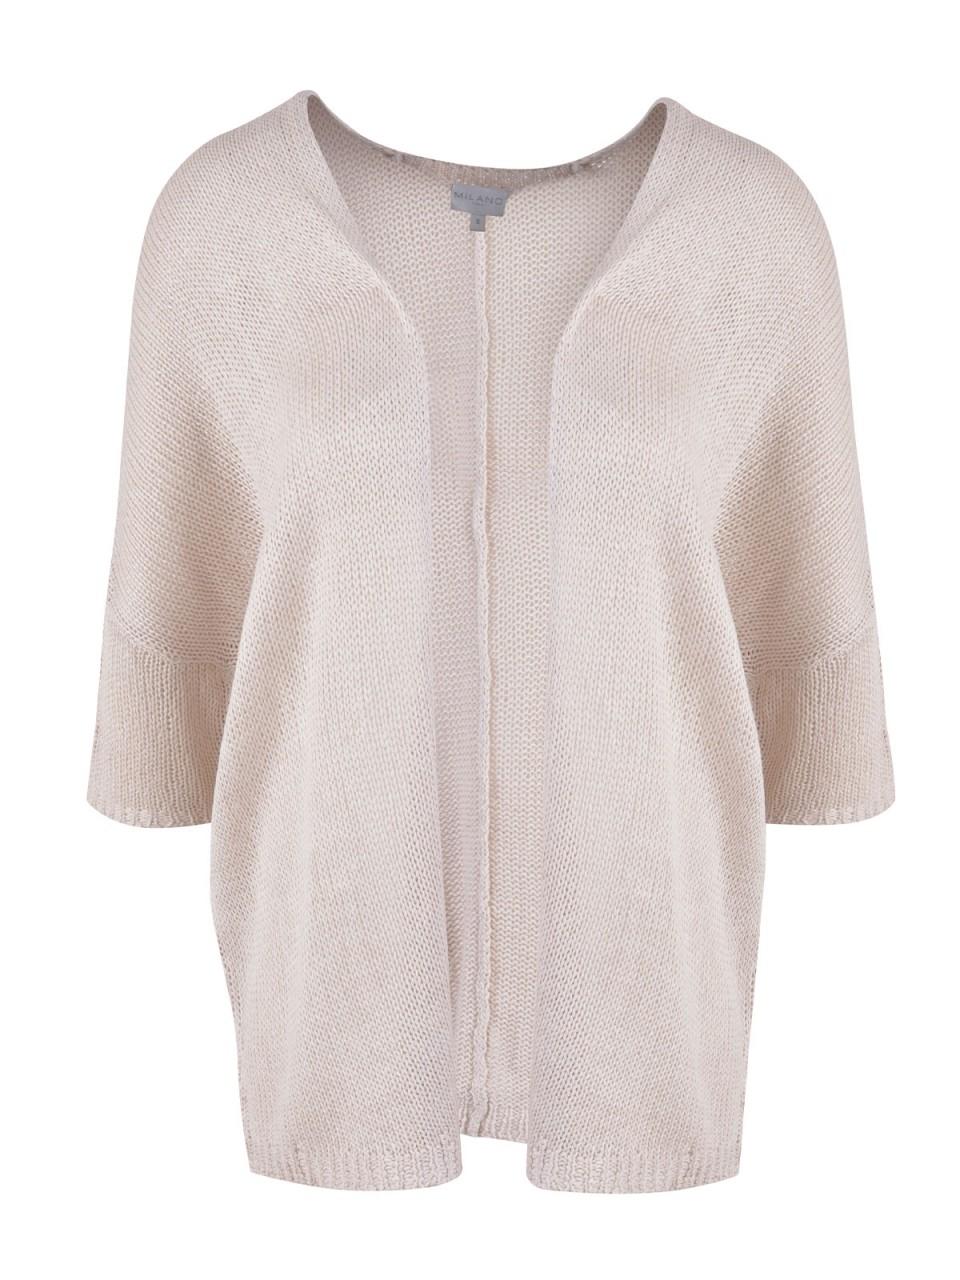 milano-italy-damen-cardigan-beige